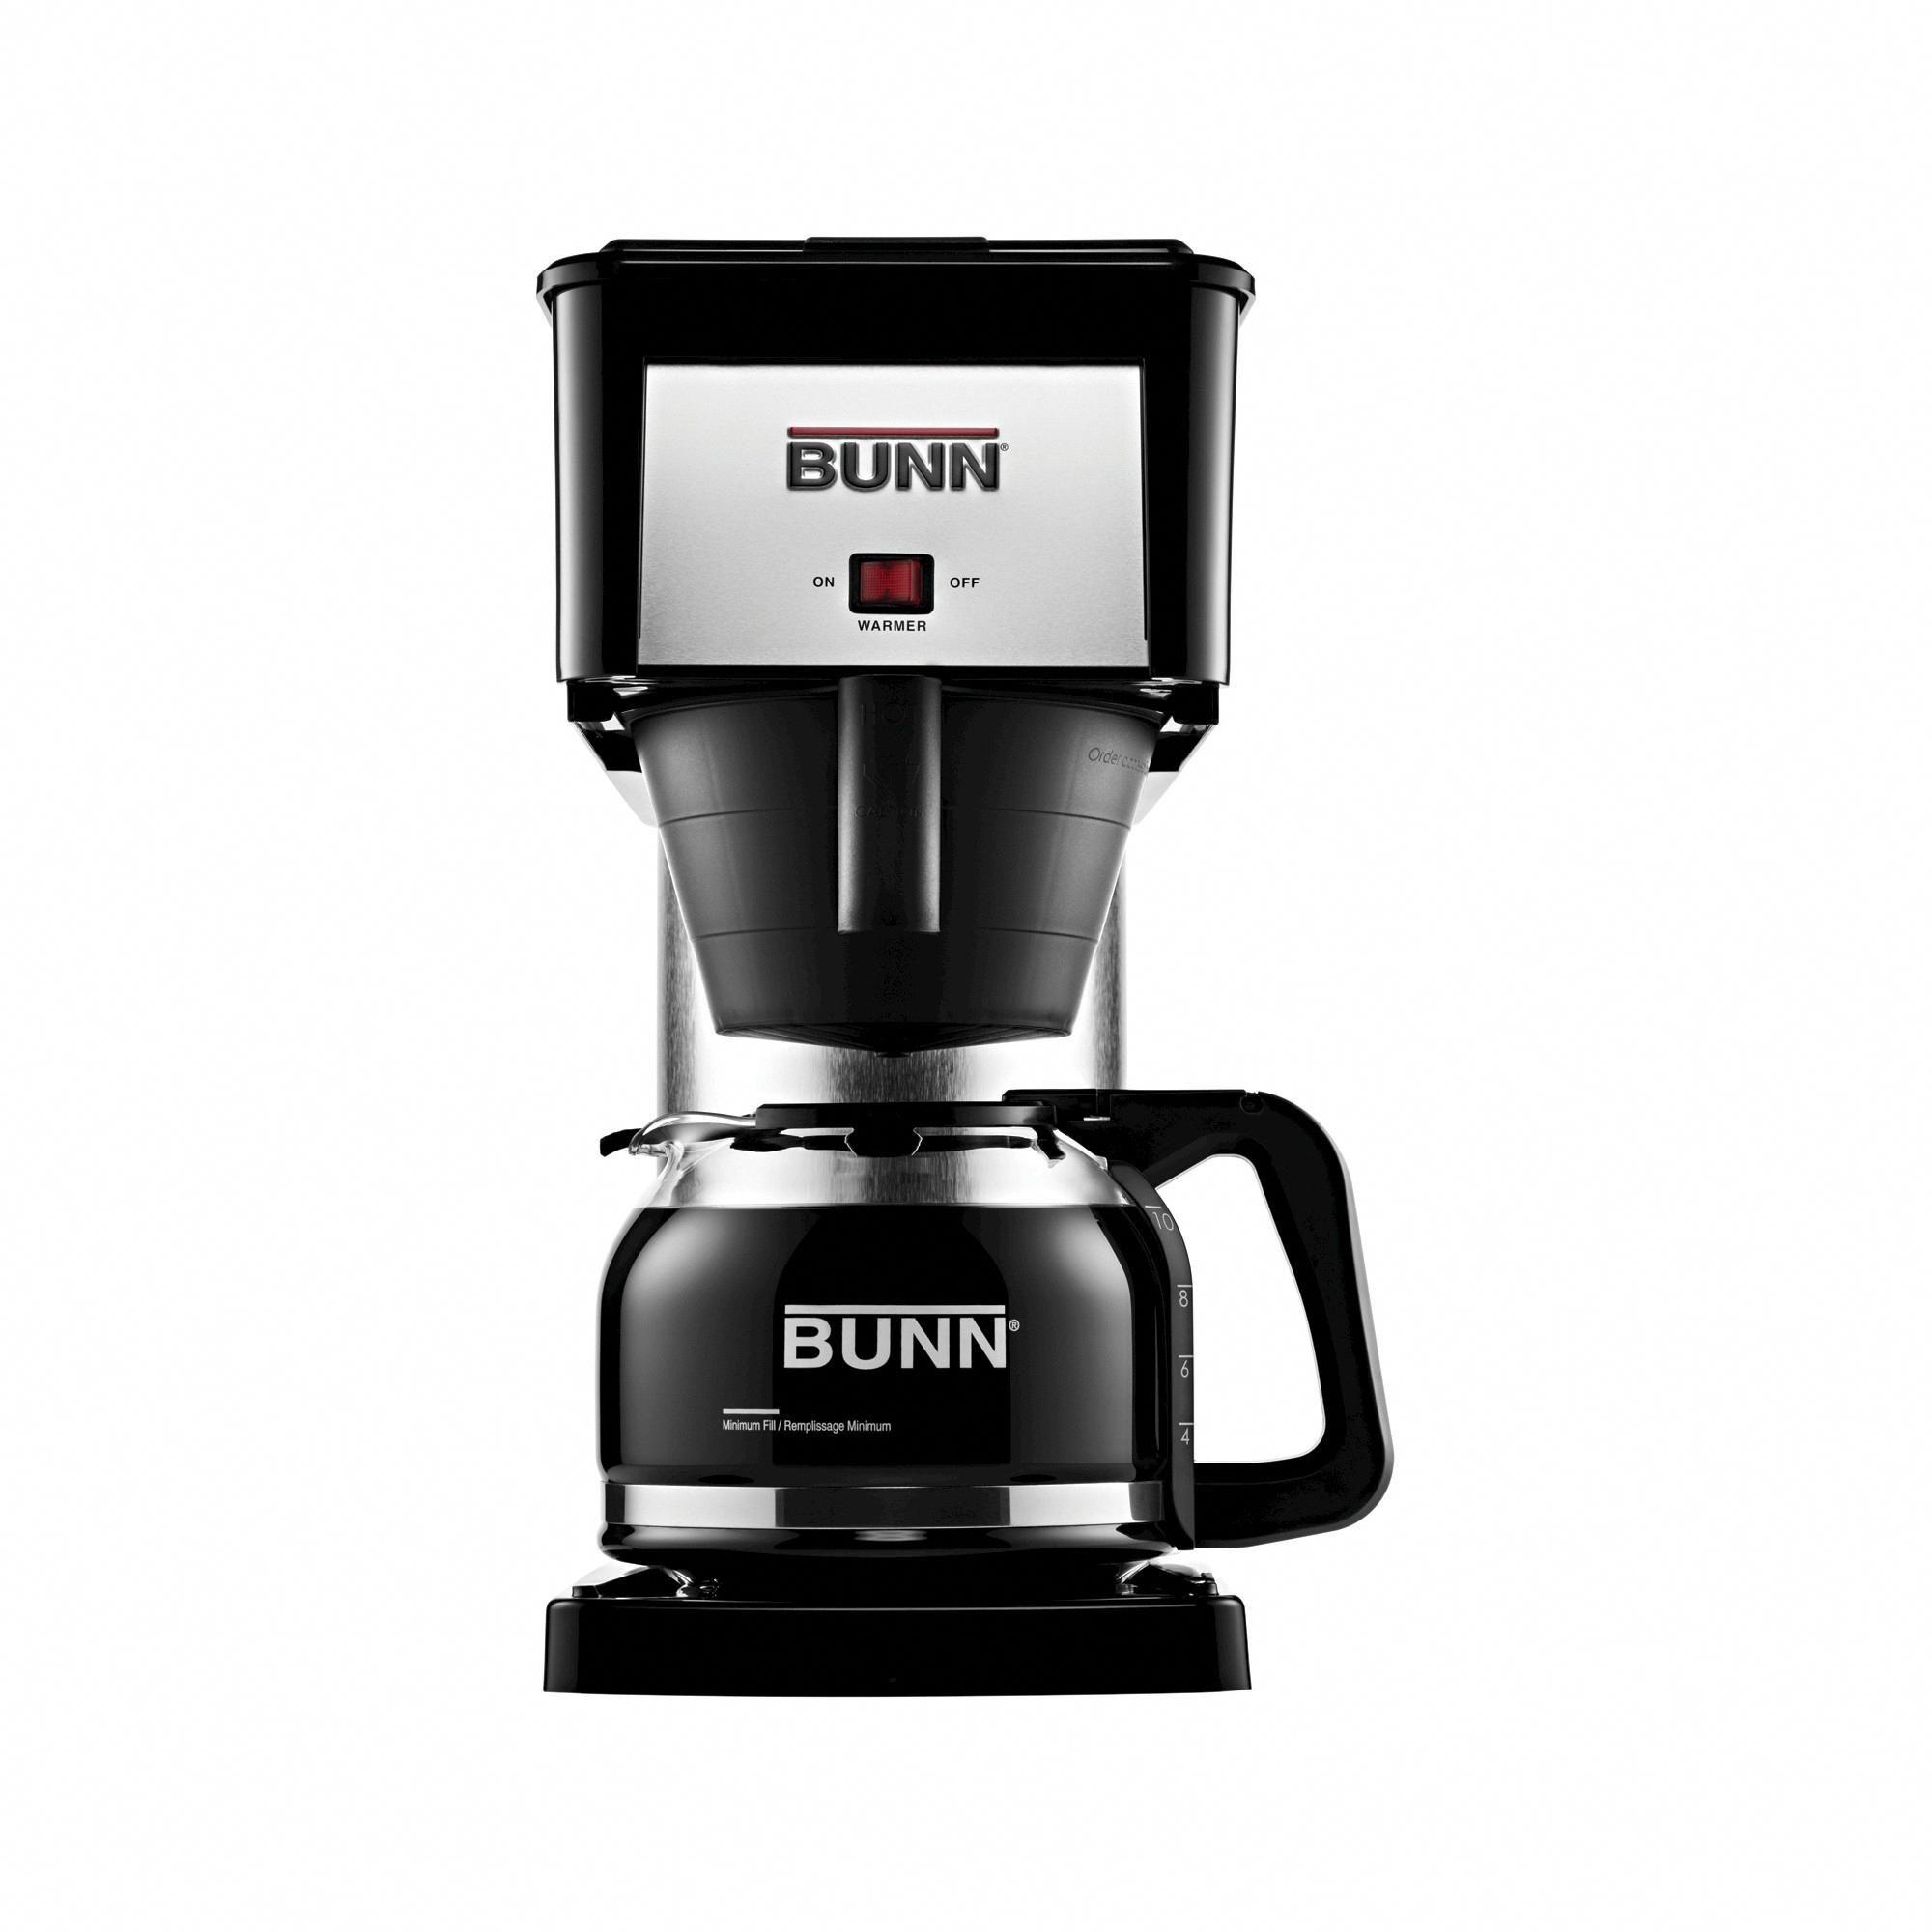 Bunn bx velocity brew cup coffee brewer black coffeeonline